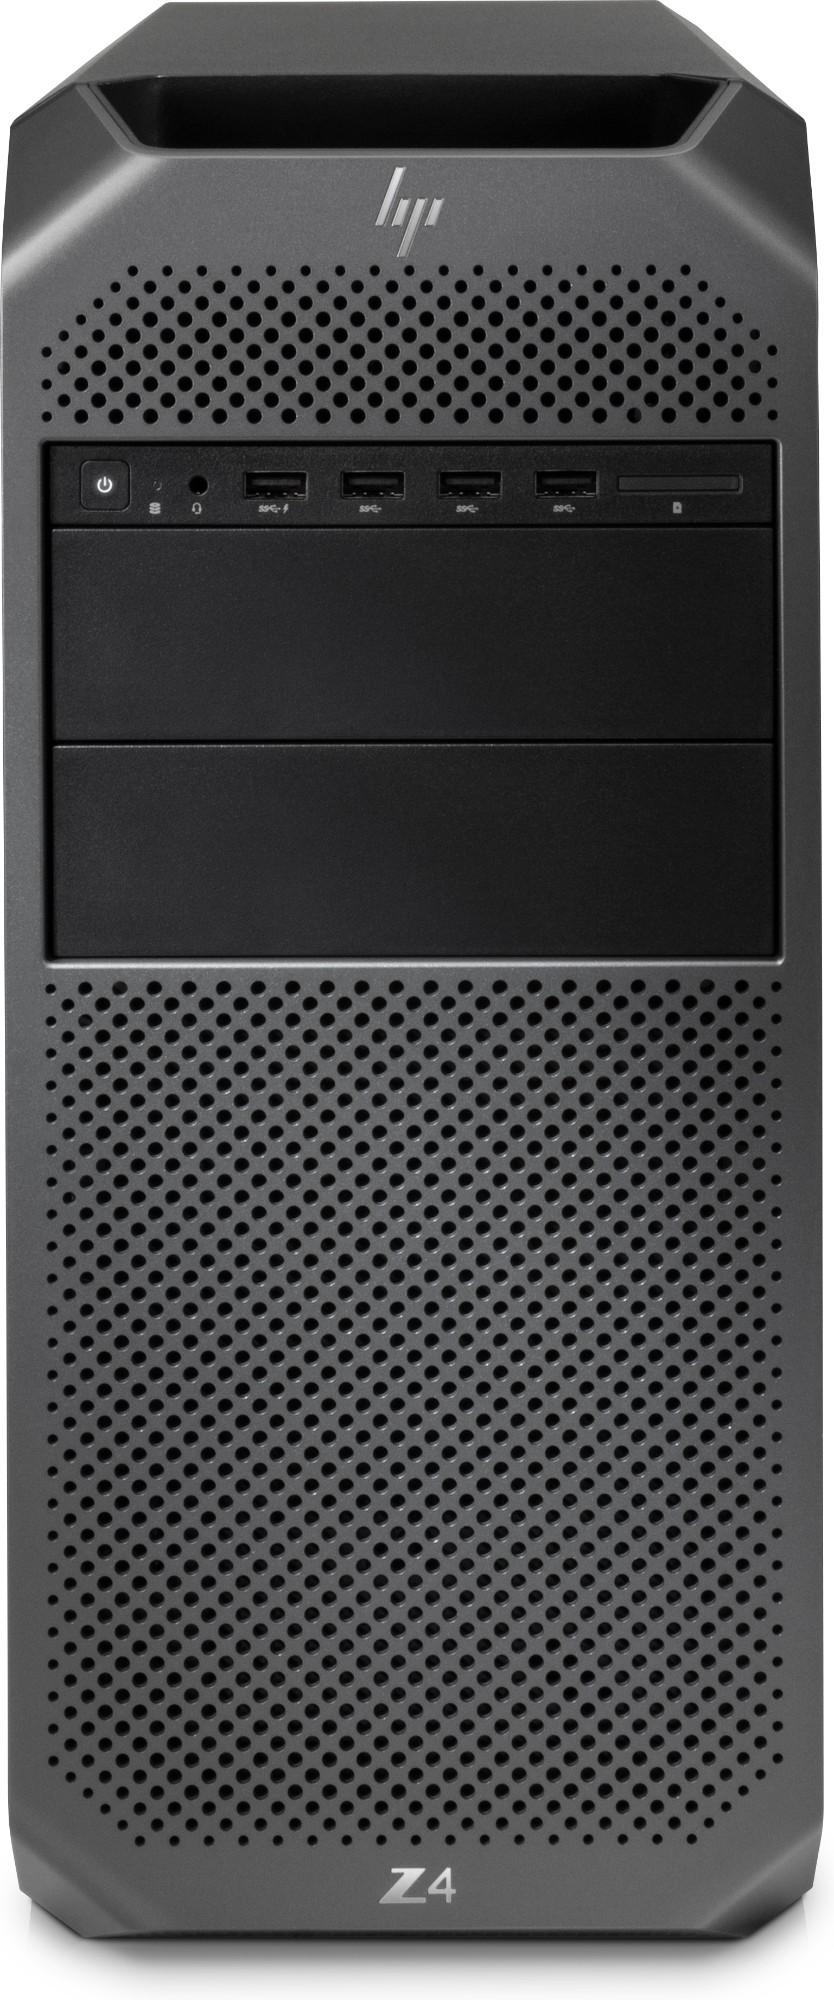 HP Z4 G4 9th gen Intel® Core™ i7 i7-9800X 16 GB DDR4-SDRAM 512 GB SSD Mini Tower Black Workstation Windows 10 Pro